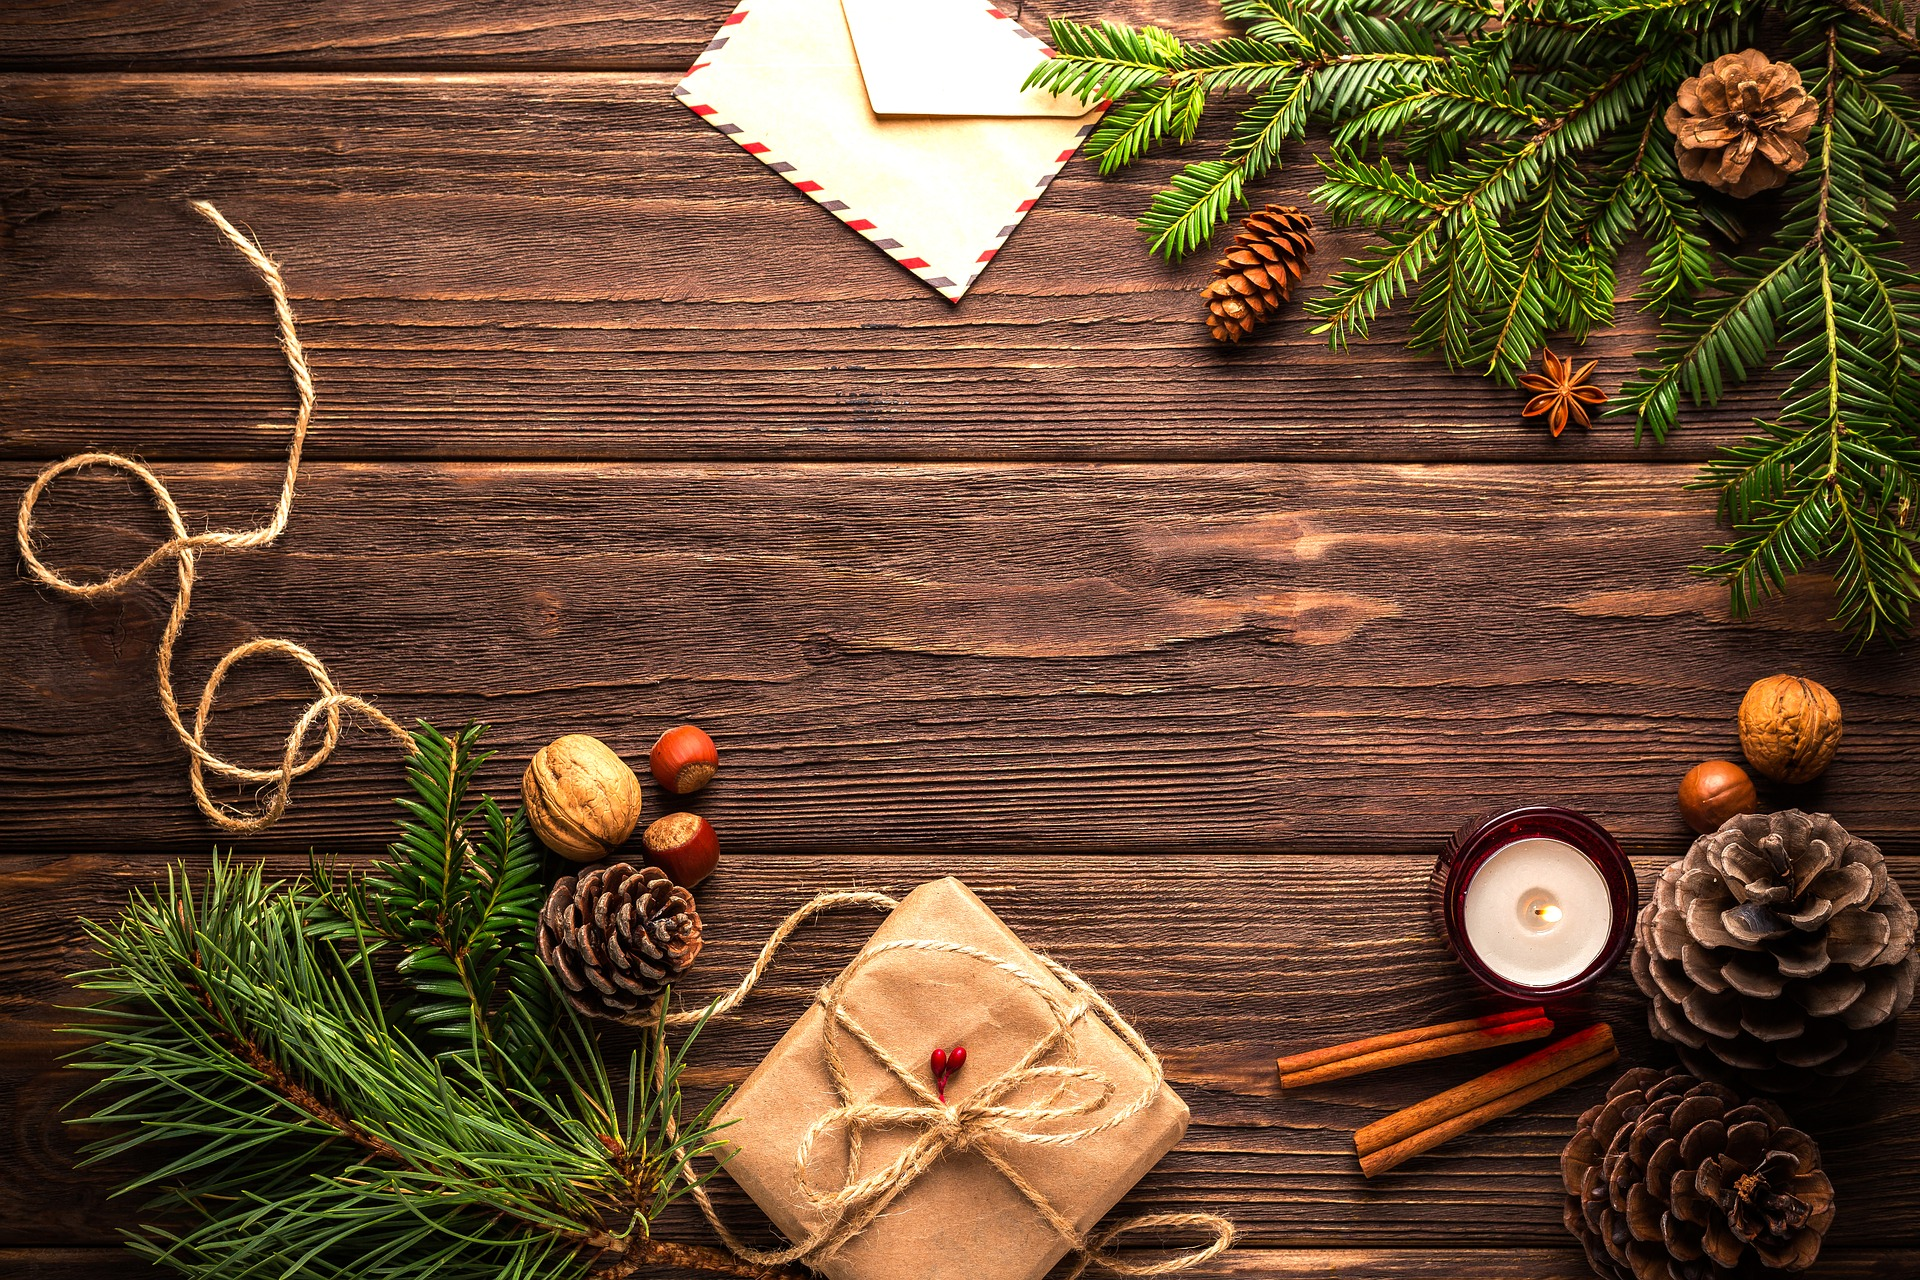 christmas-1911637_1920.jpg